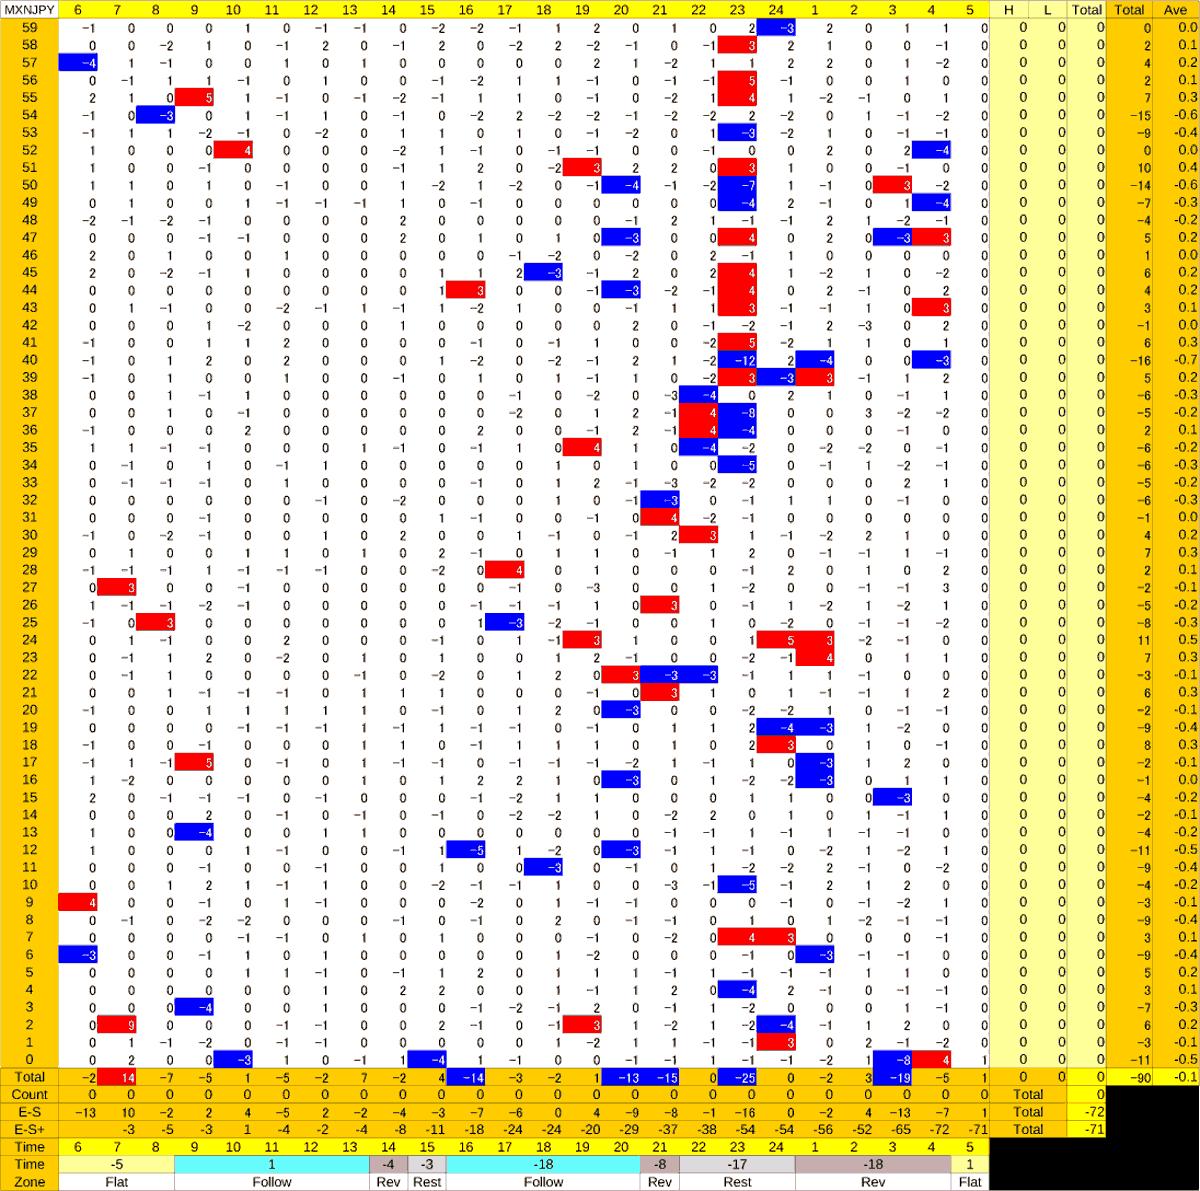 20200626_HS(3)MXNJPY